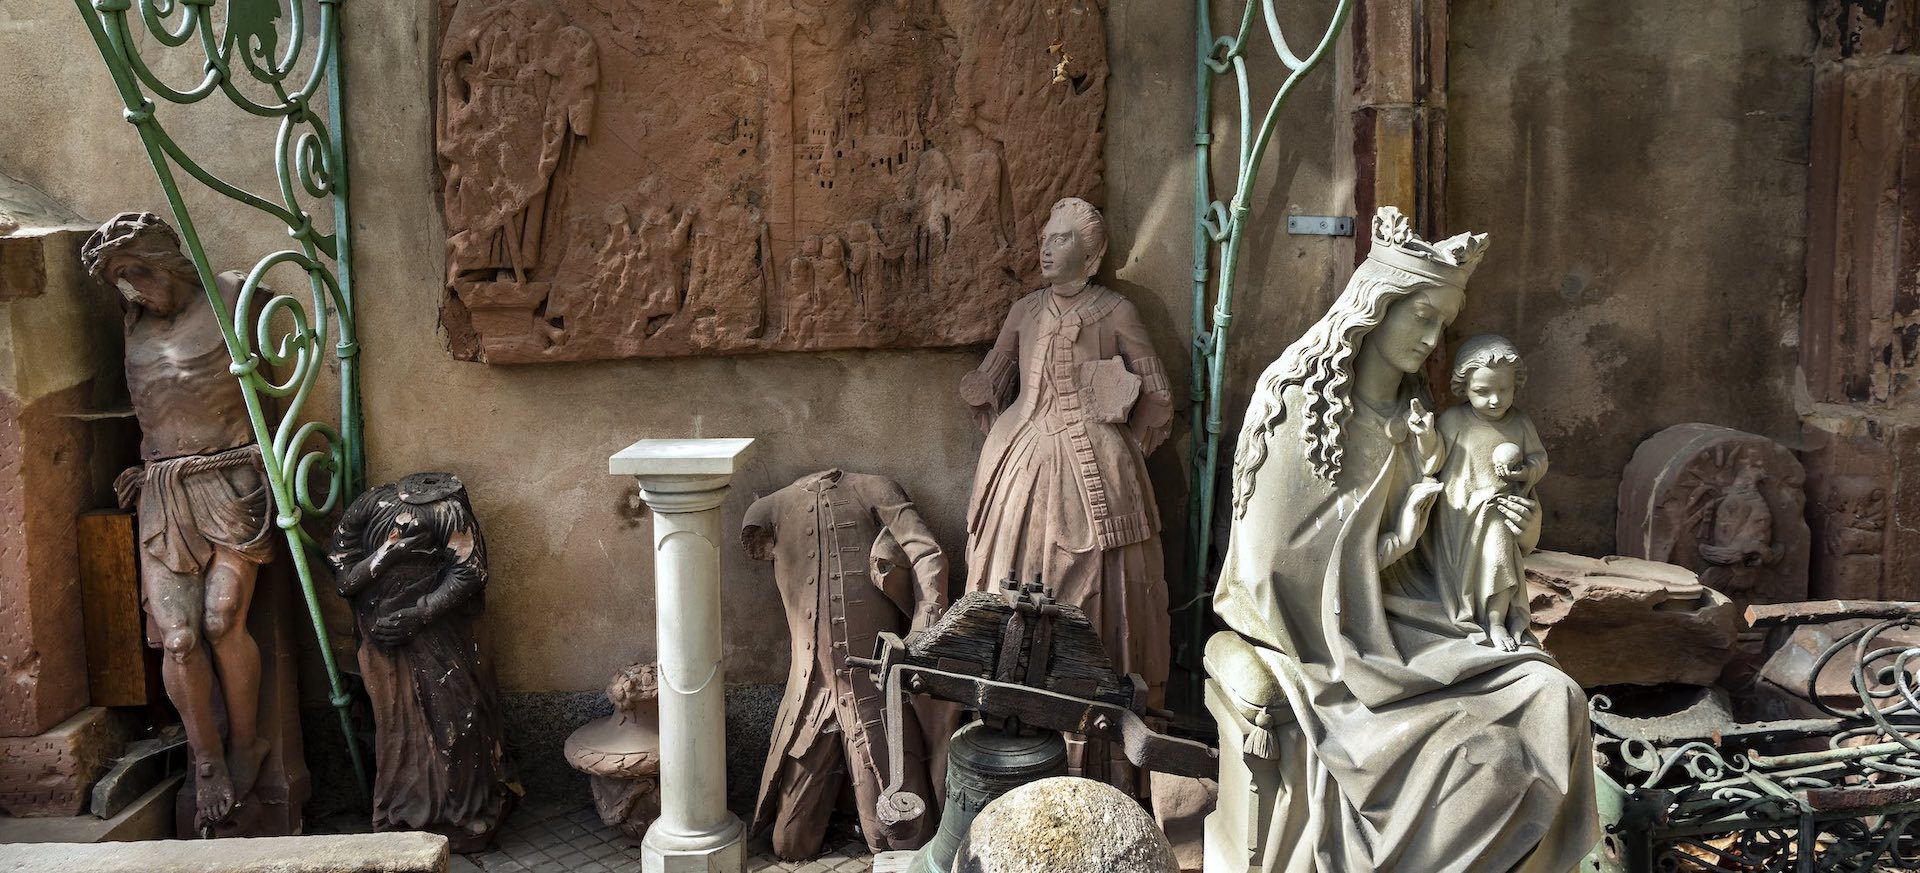 Statues Haguenau © Frantisek Zvardon